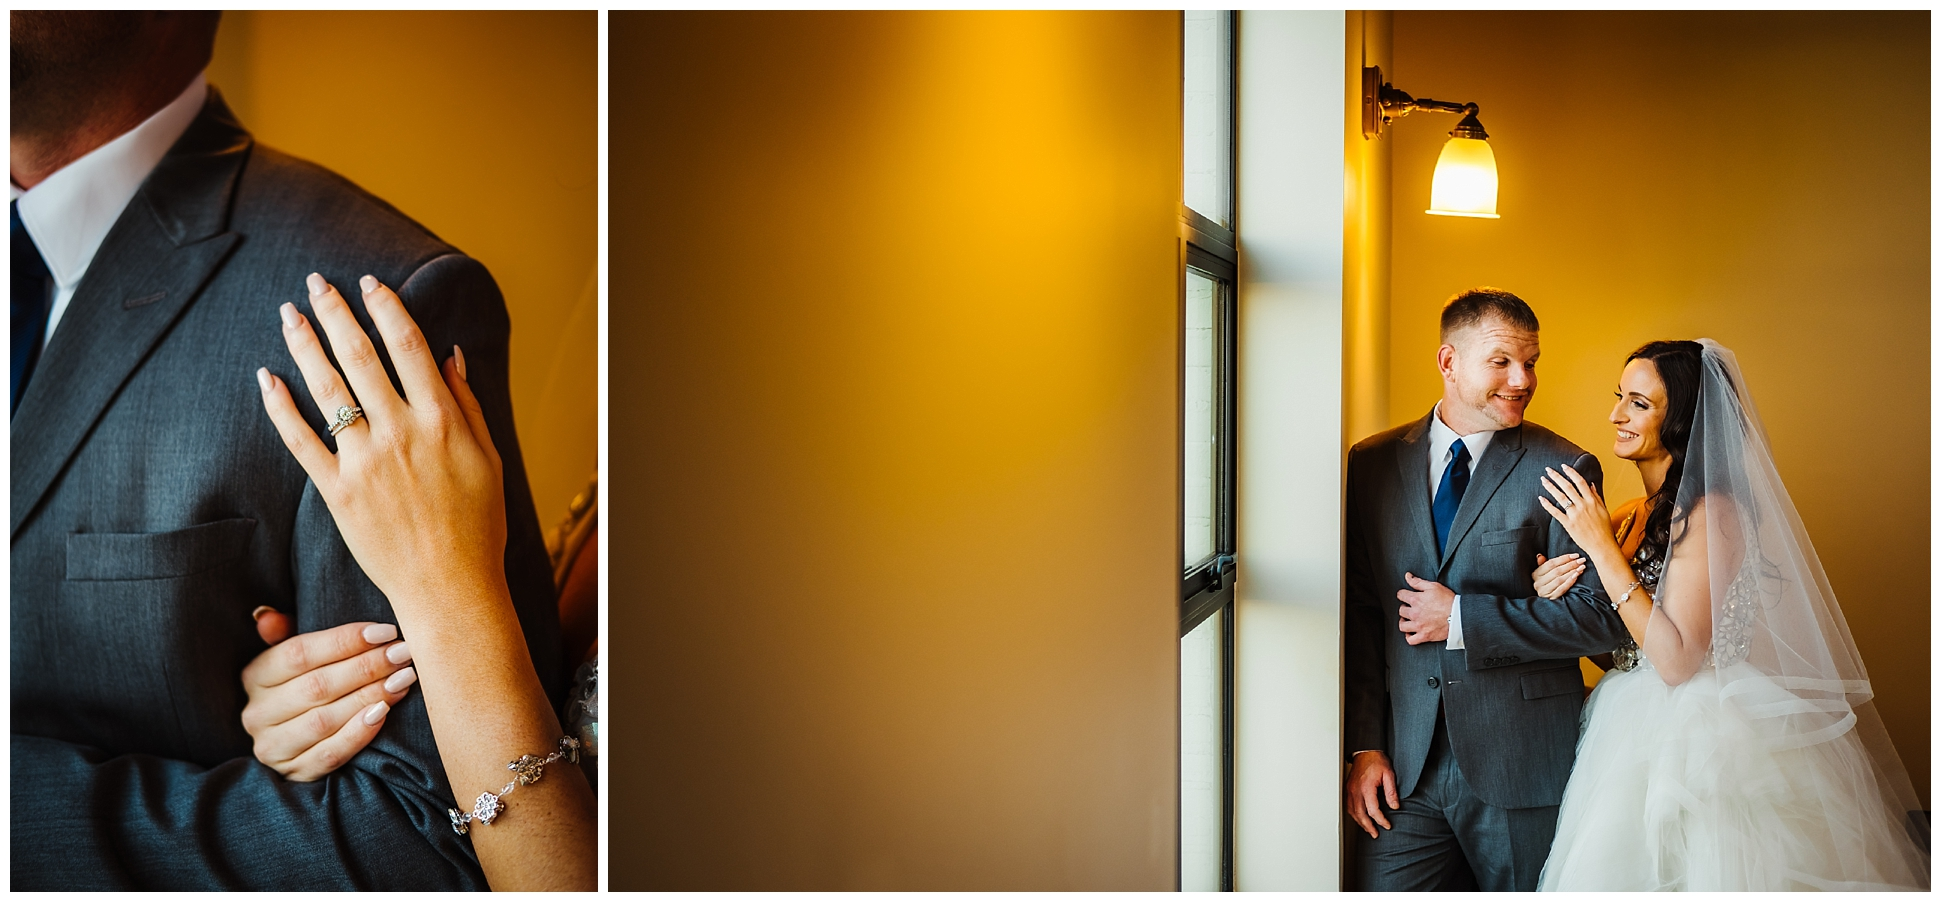 tampa-wedding-photographer-oxford-exchange-garland-candlelight-gold-hayley-paige_0026.jpg